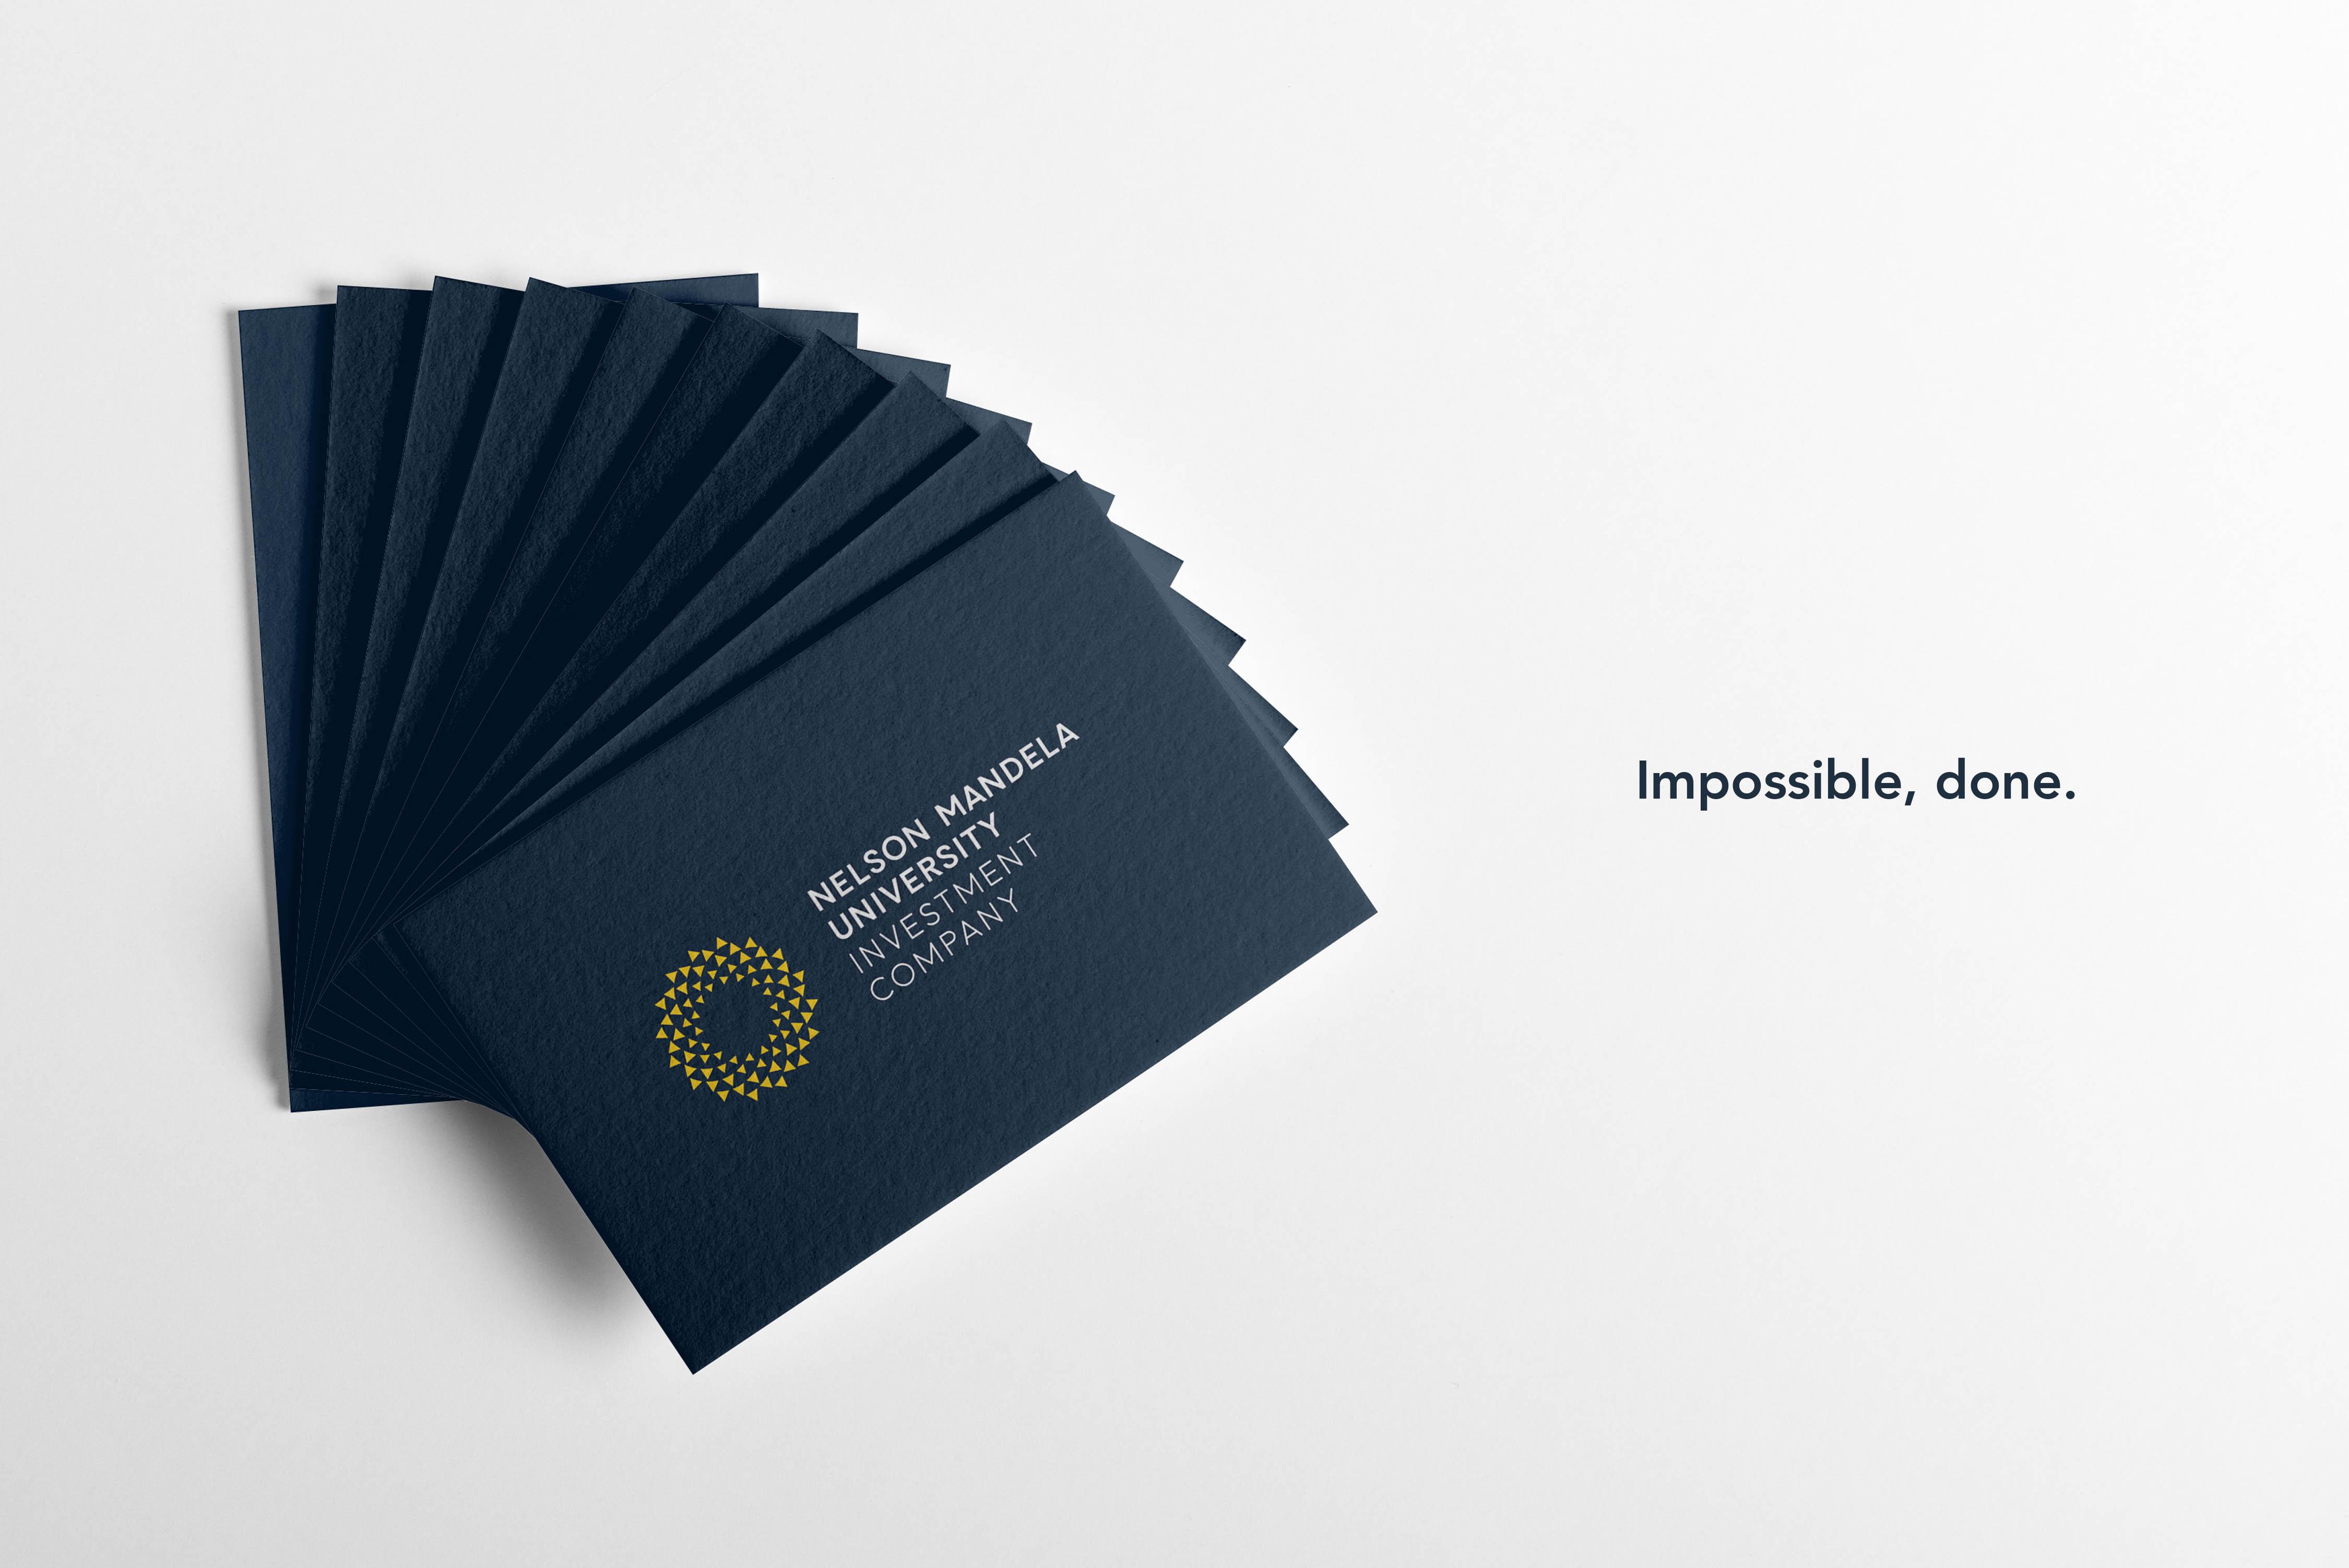 Creative Caterpillar client Nelson Mandela University Investment Company business cards.